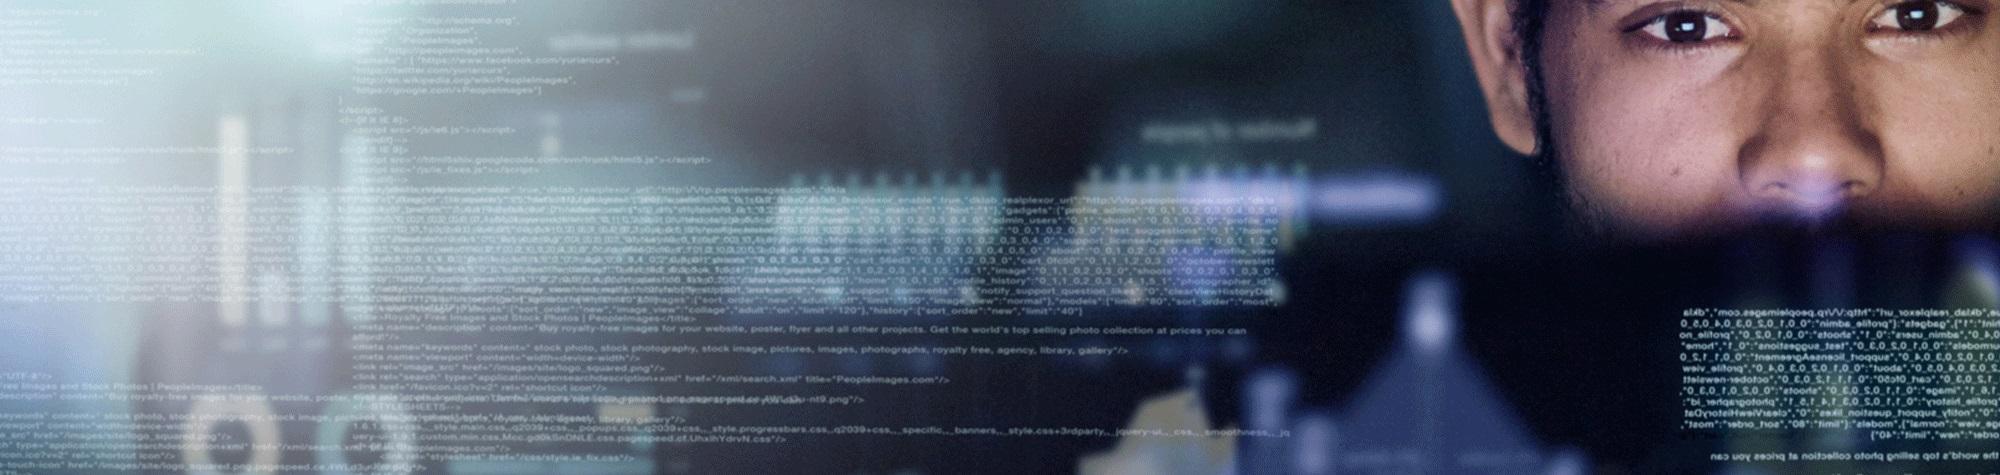 Big Data: tomar decisiones sobre el análisis de datos